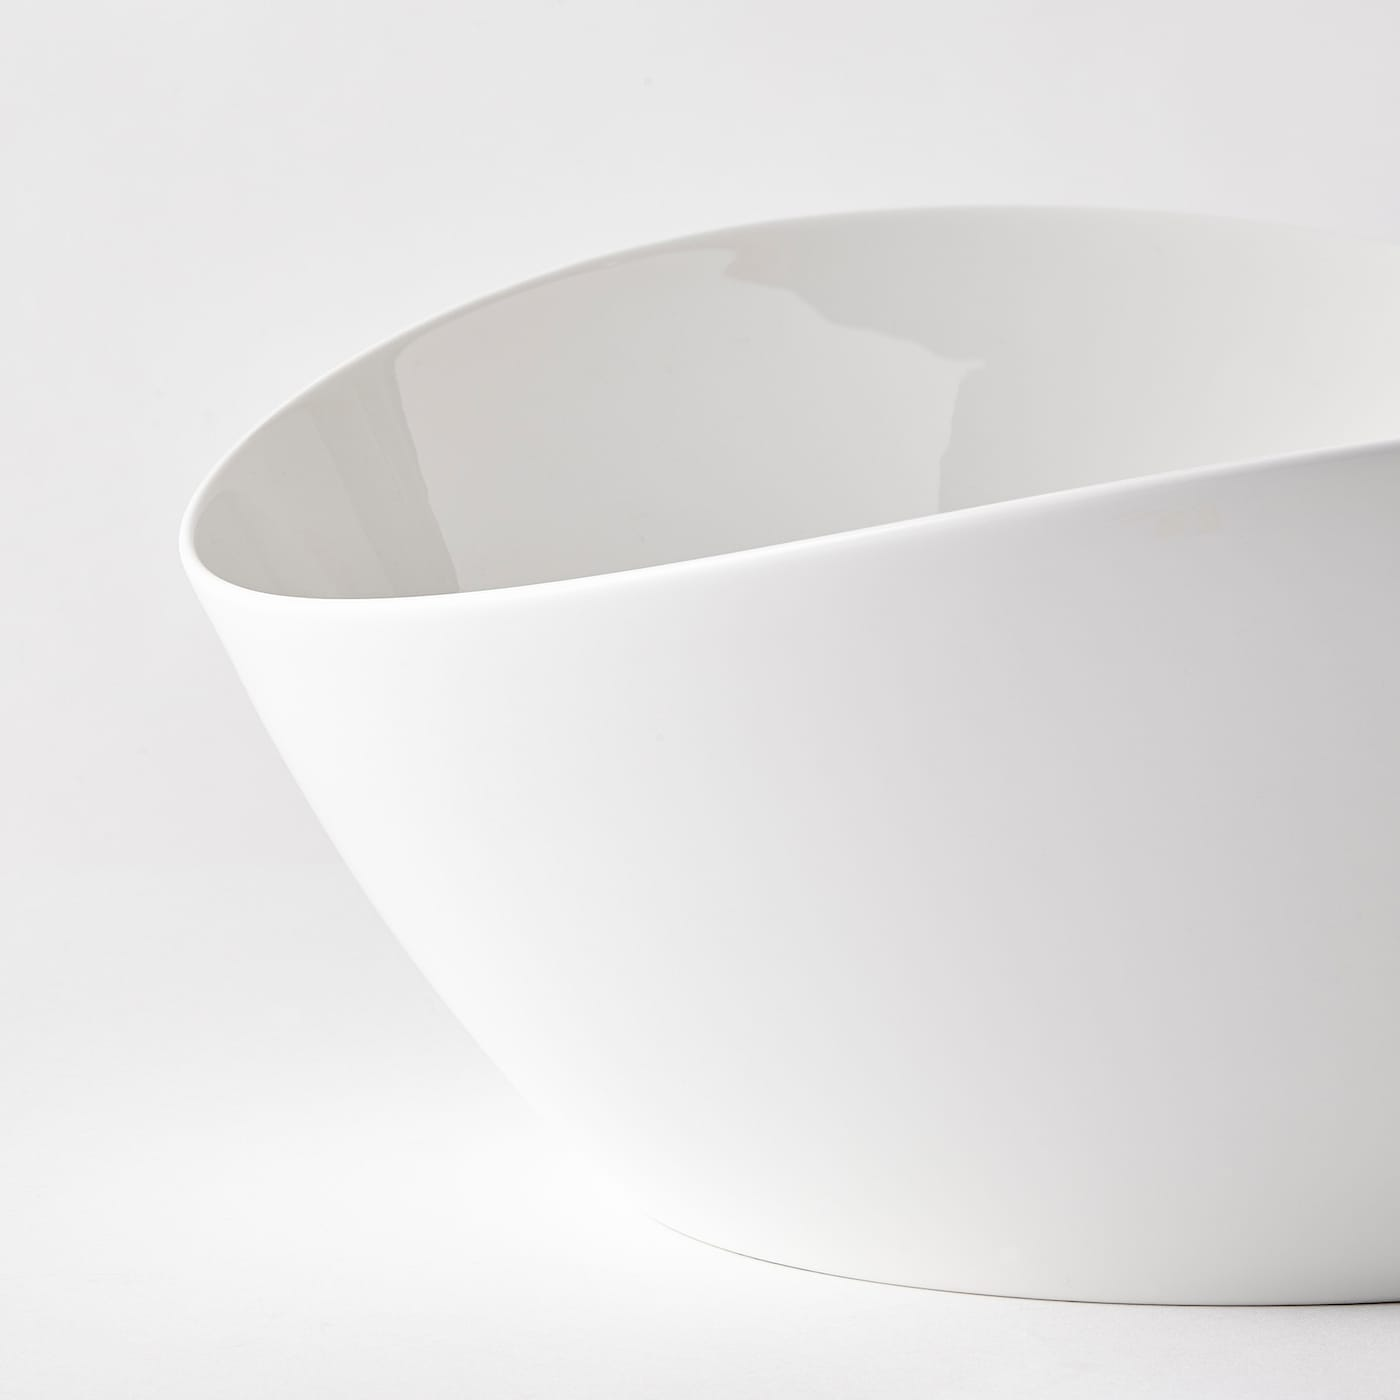 SKYN Serveringsskål, vit, 31 cm